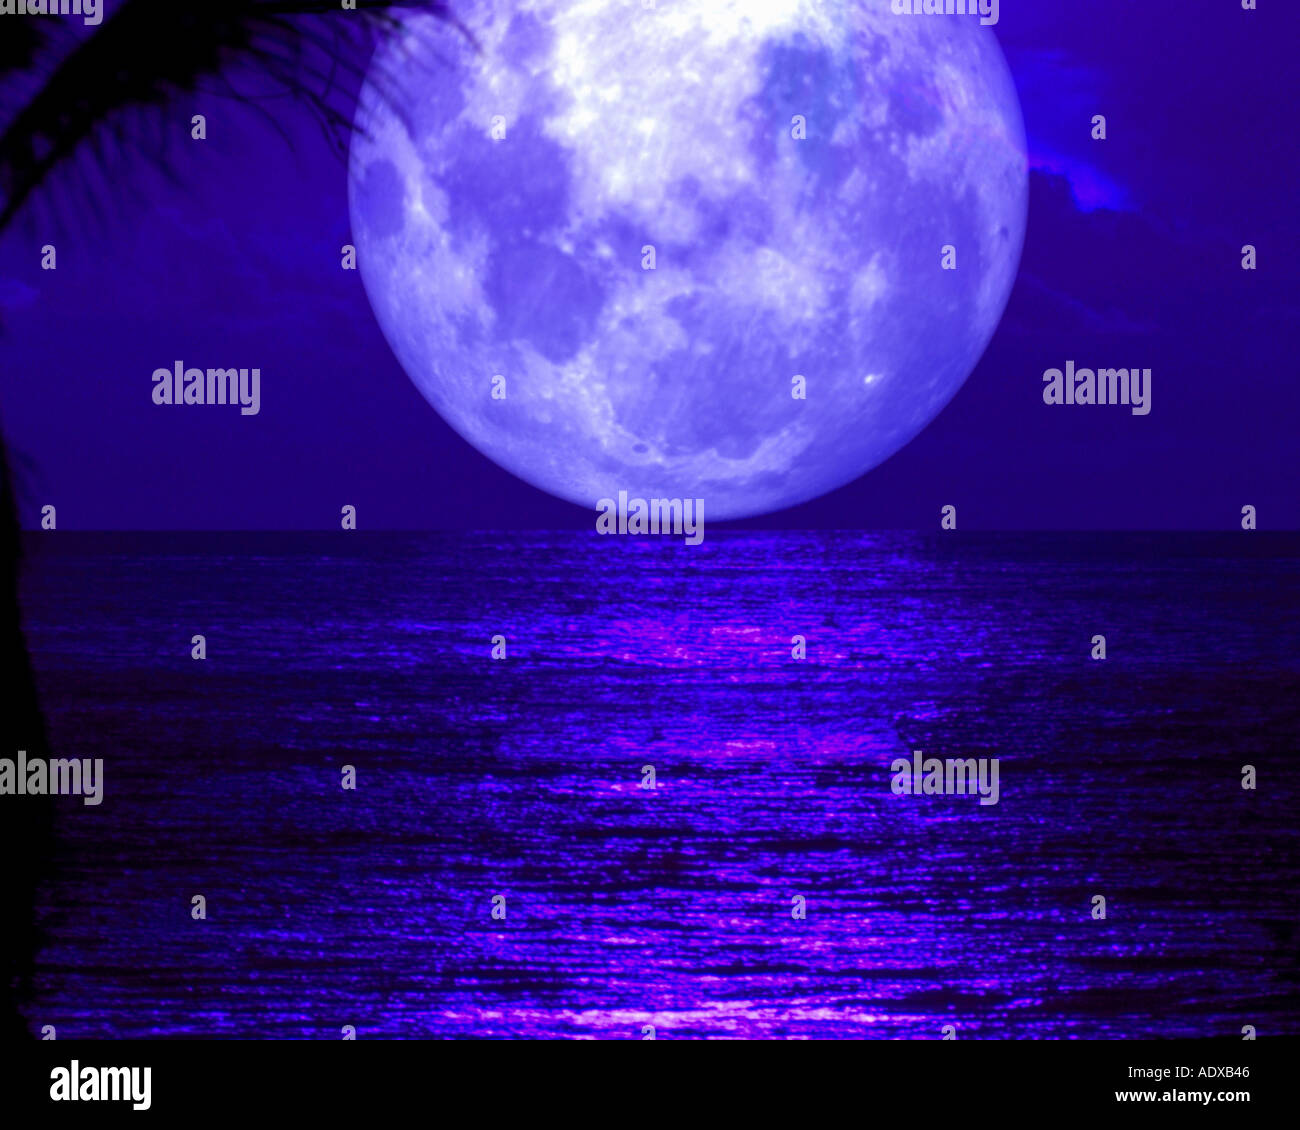 Concepts landscape night moonshine bluish moonlight full horizon beach palm reflection romantic vacations blue round astronomy m - Stock Image